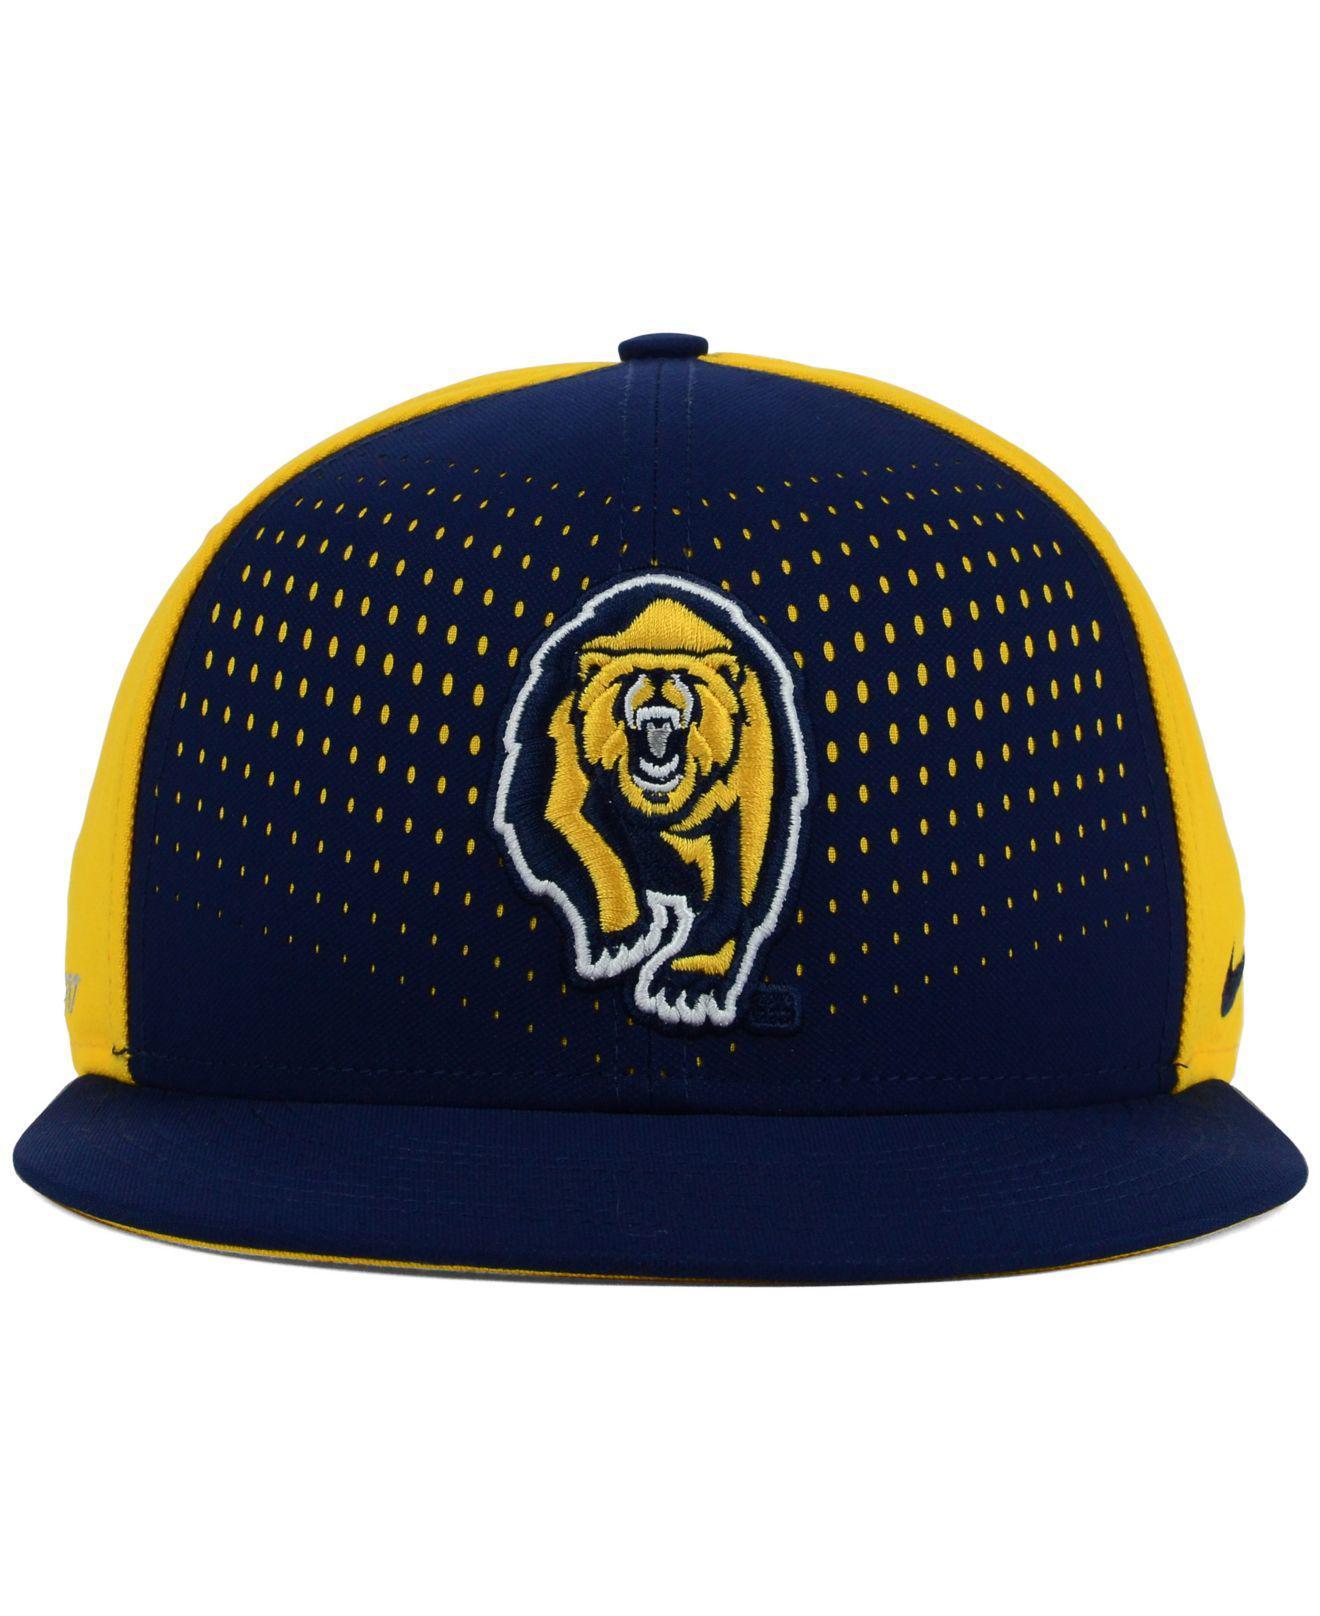 5953ab26 ... shopping lyst nike california golden bears true seasonal snapback cap  in blue for men 05141 72af5